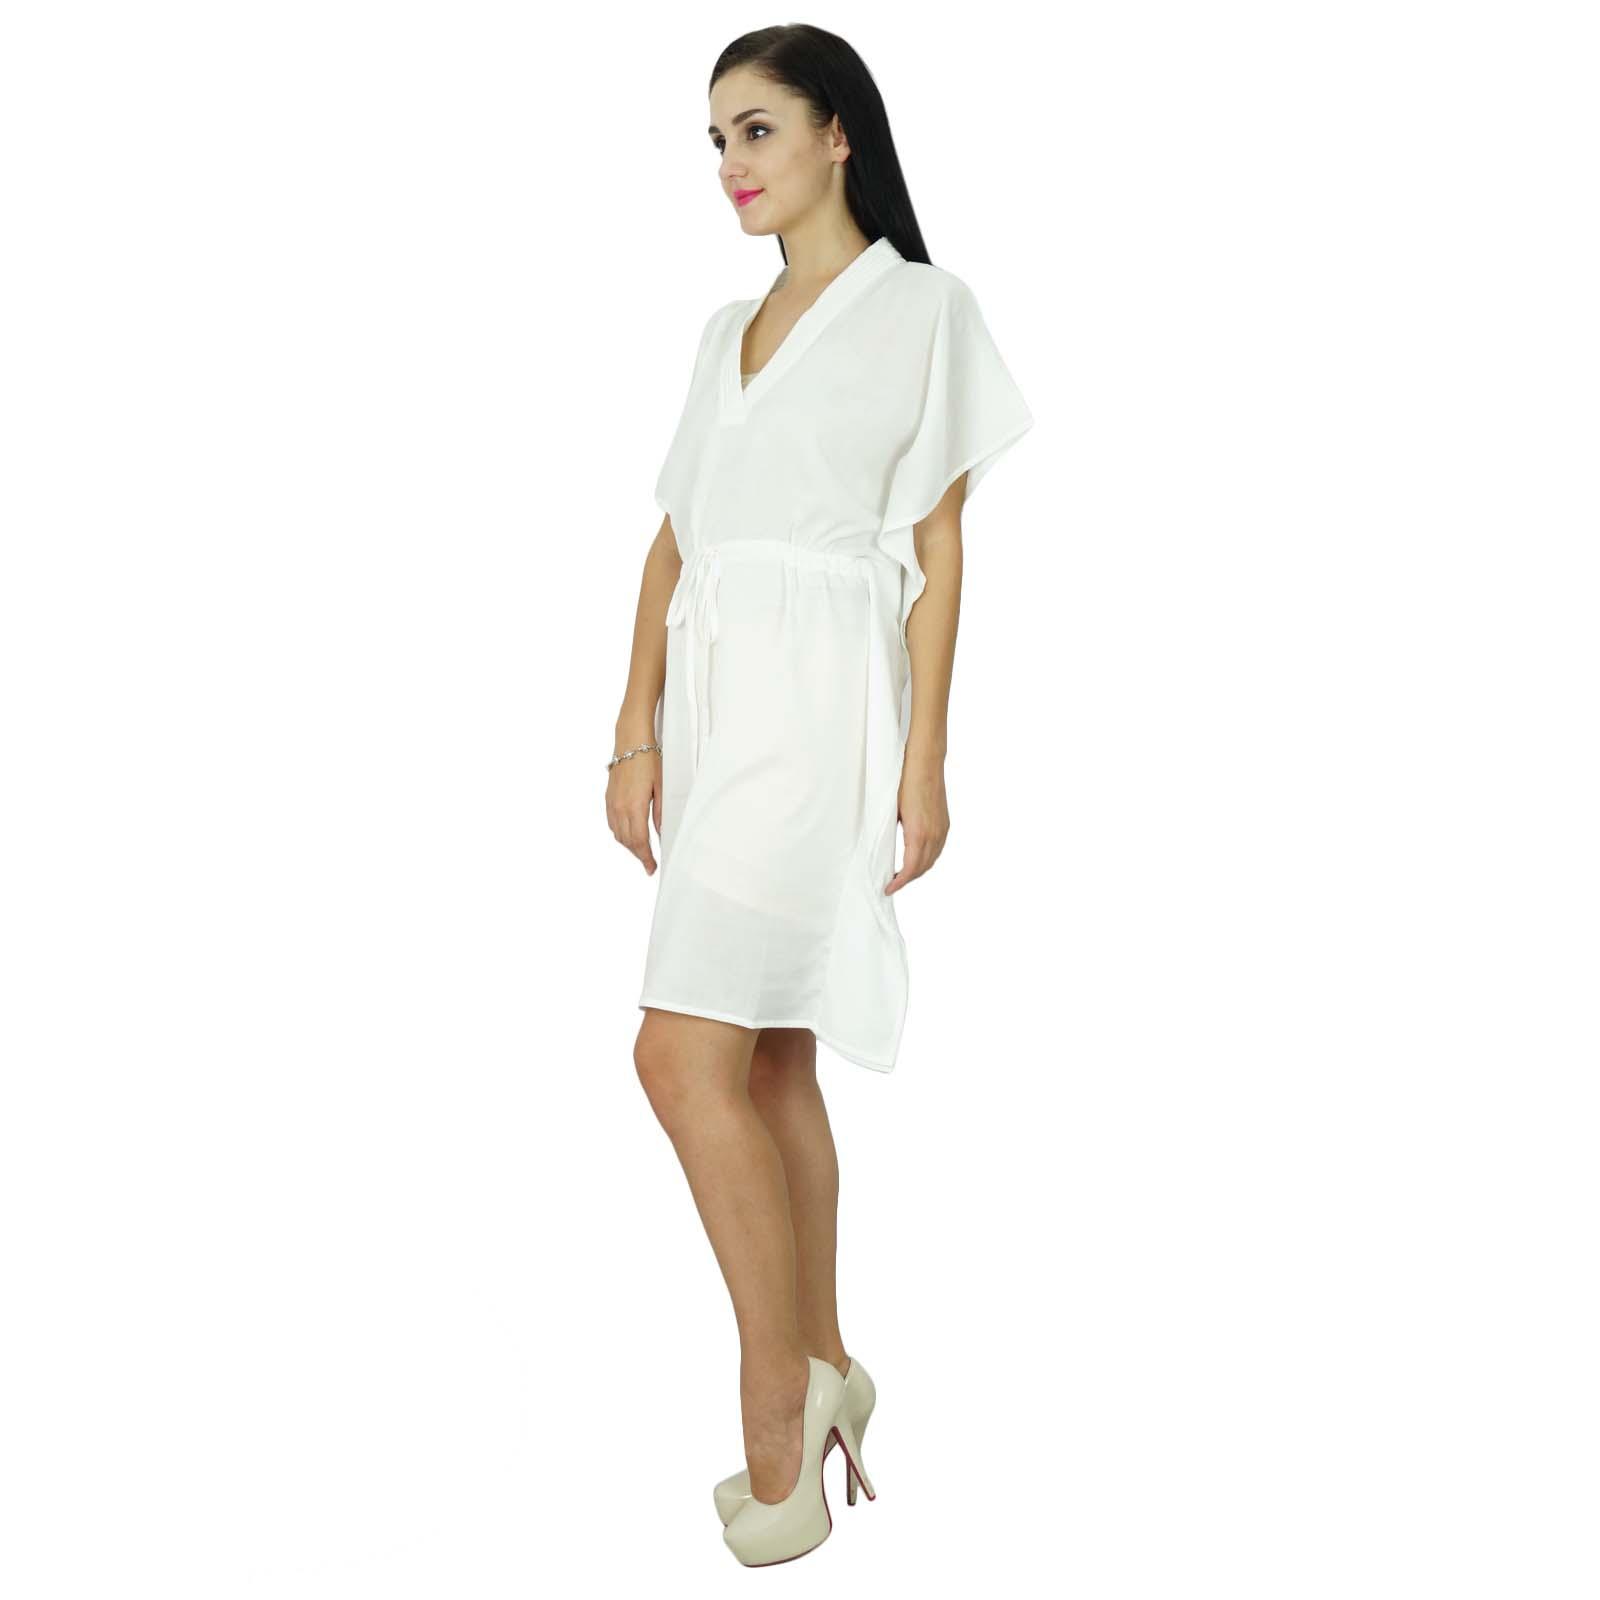 thumbnail 37 - Bimba Women Plain Kaftan Dress Beach Cover Up Cotton Solid Caftan-58z